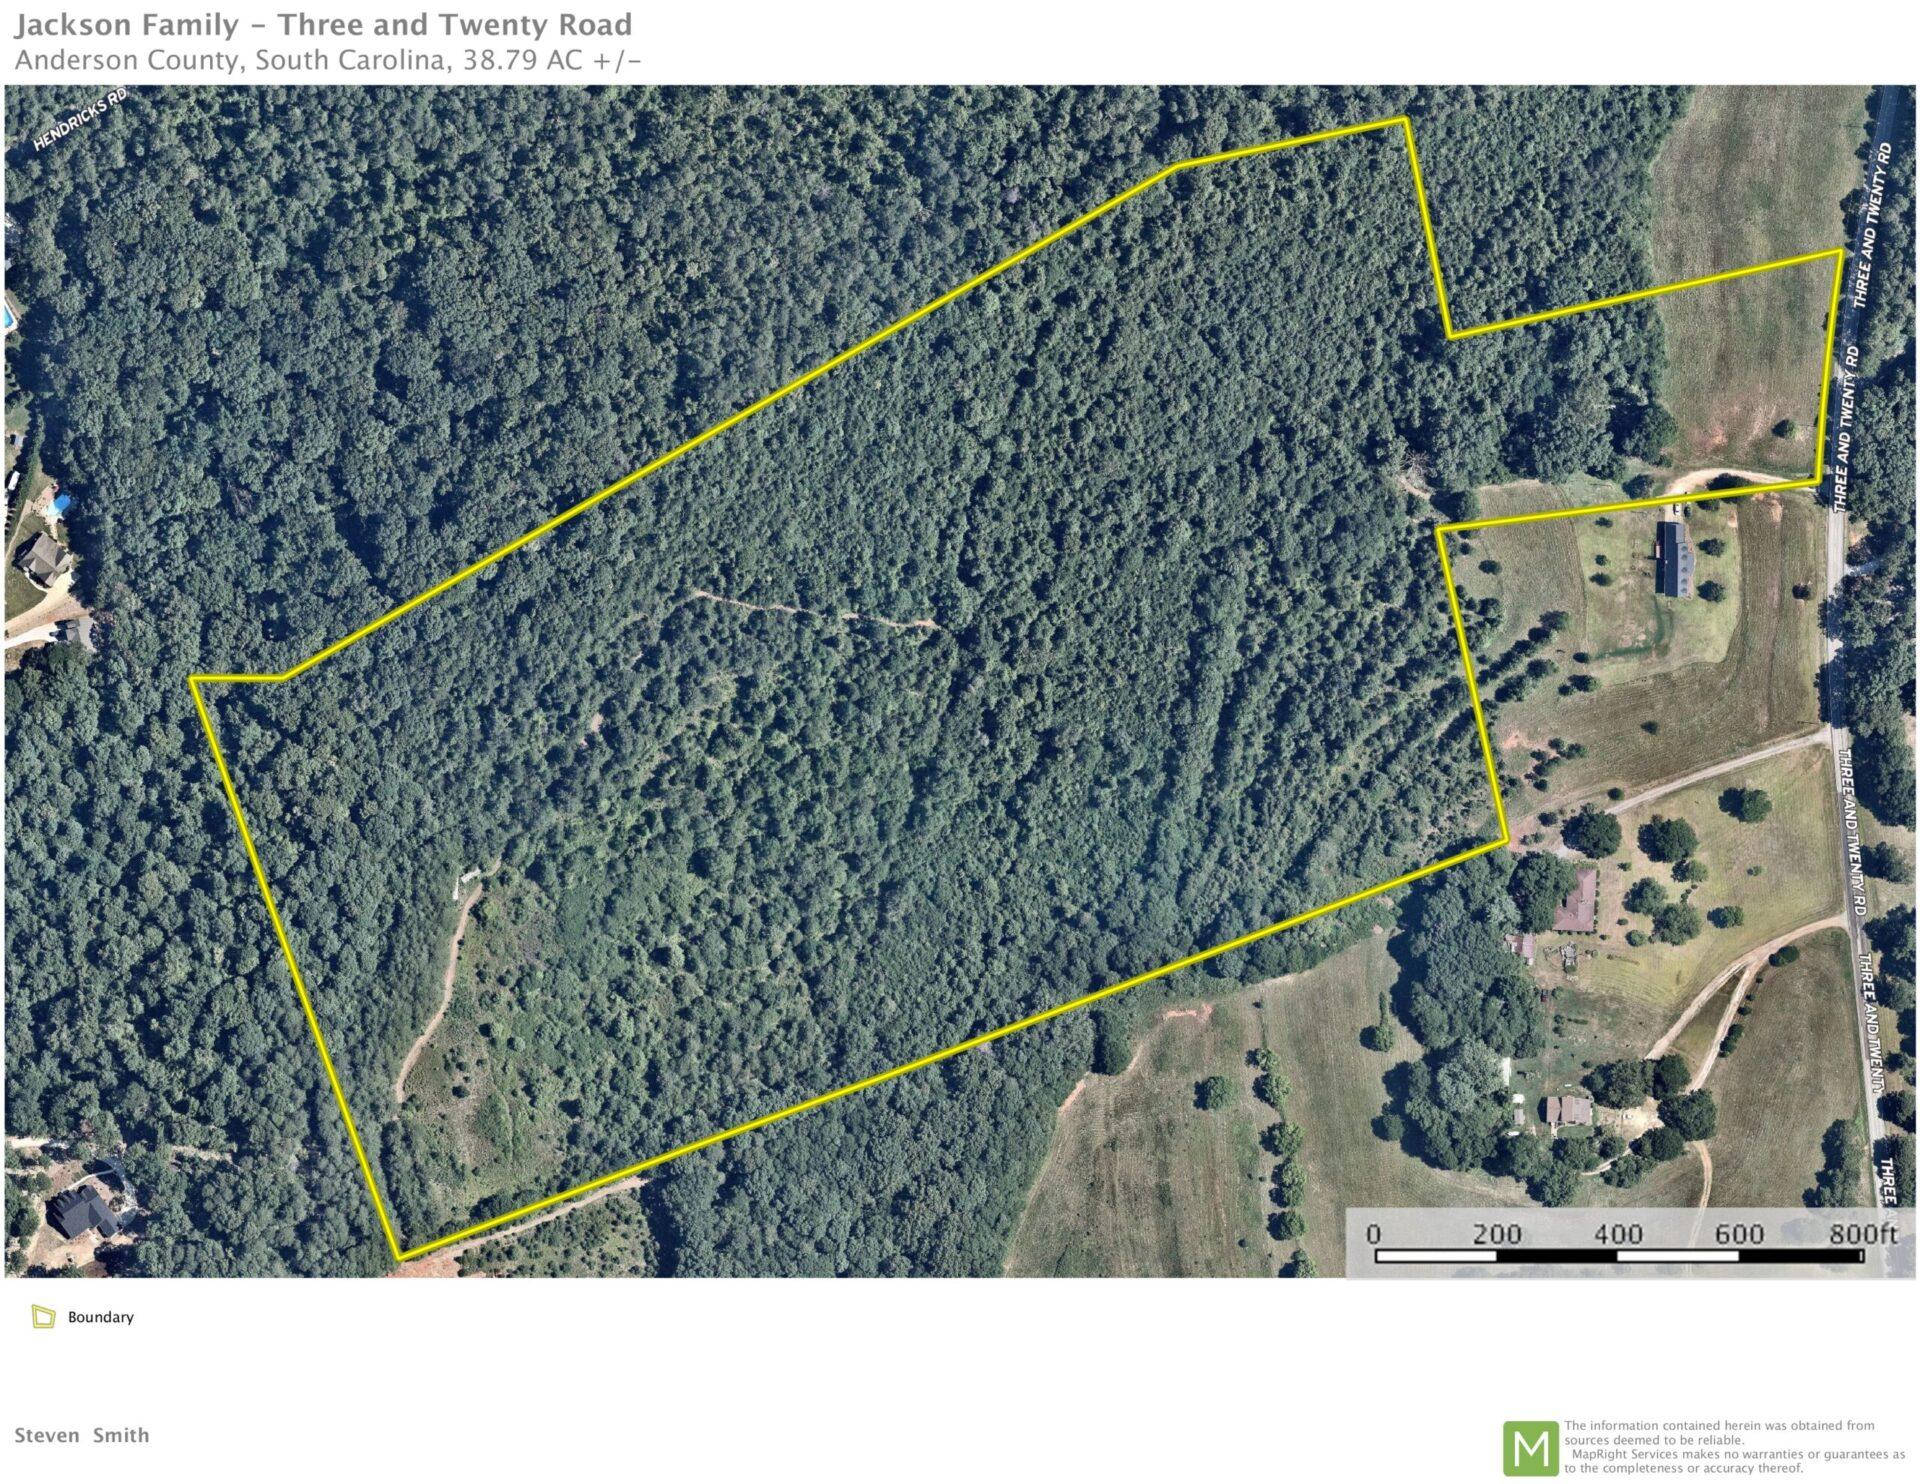 +/-38.79 Acres-Development opportunity near Easley, SC